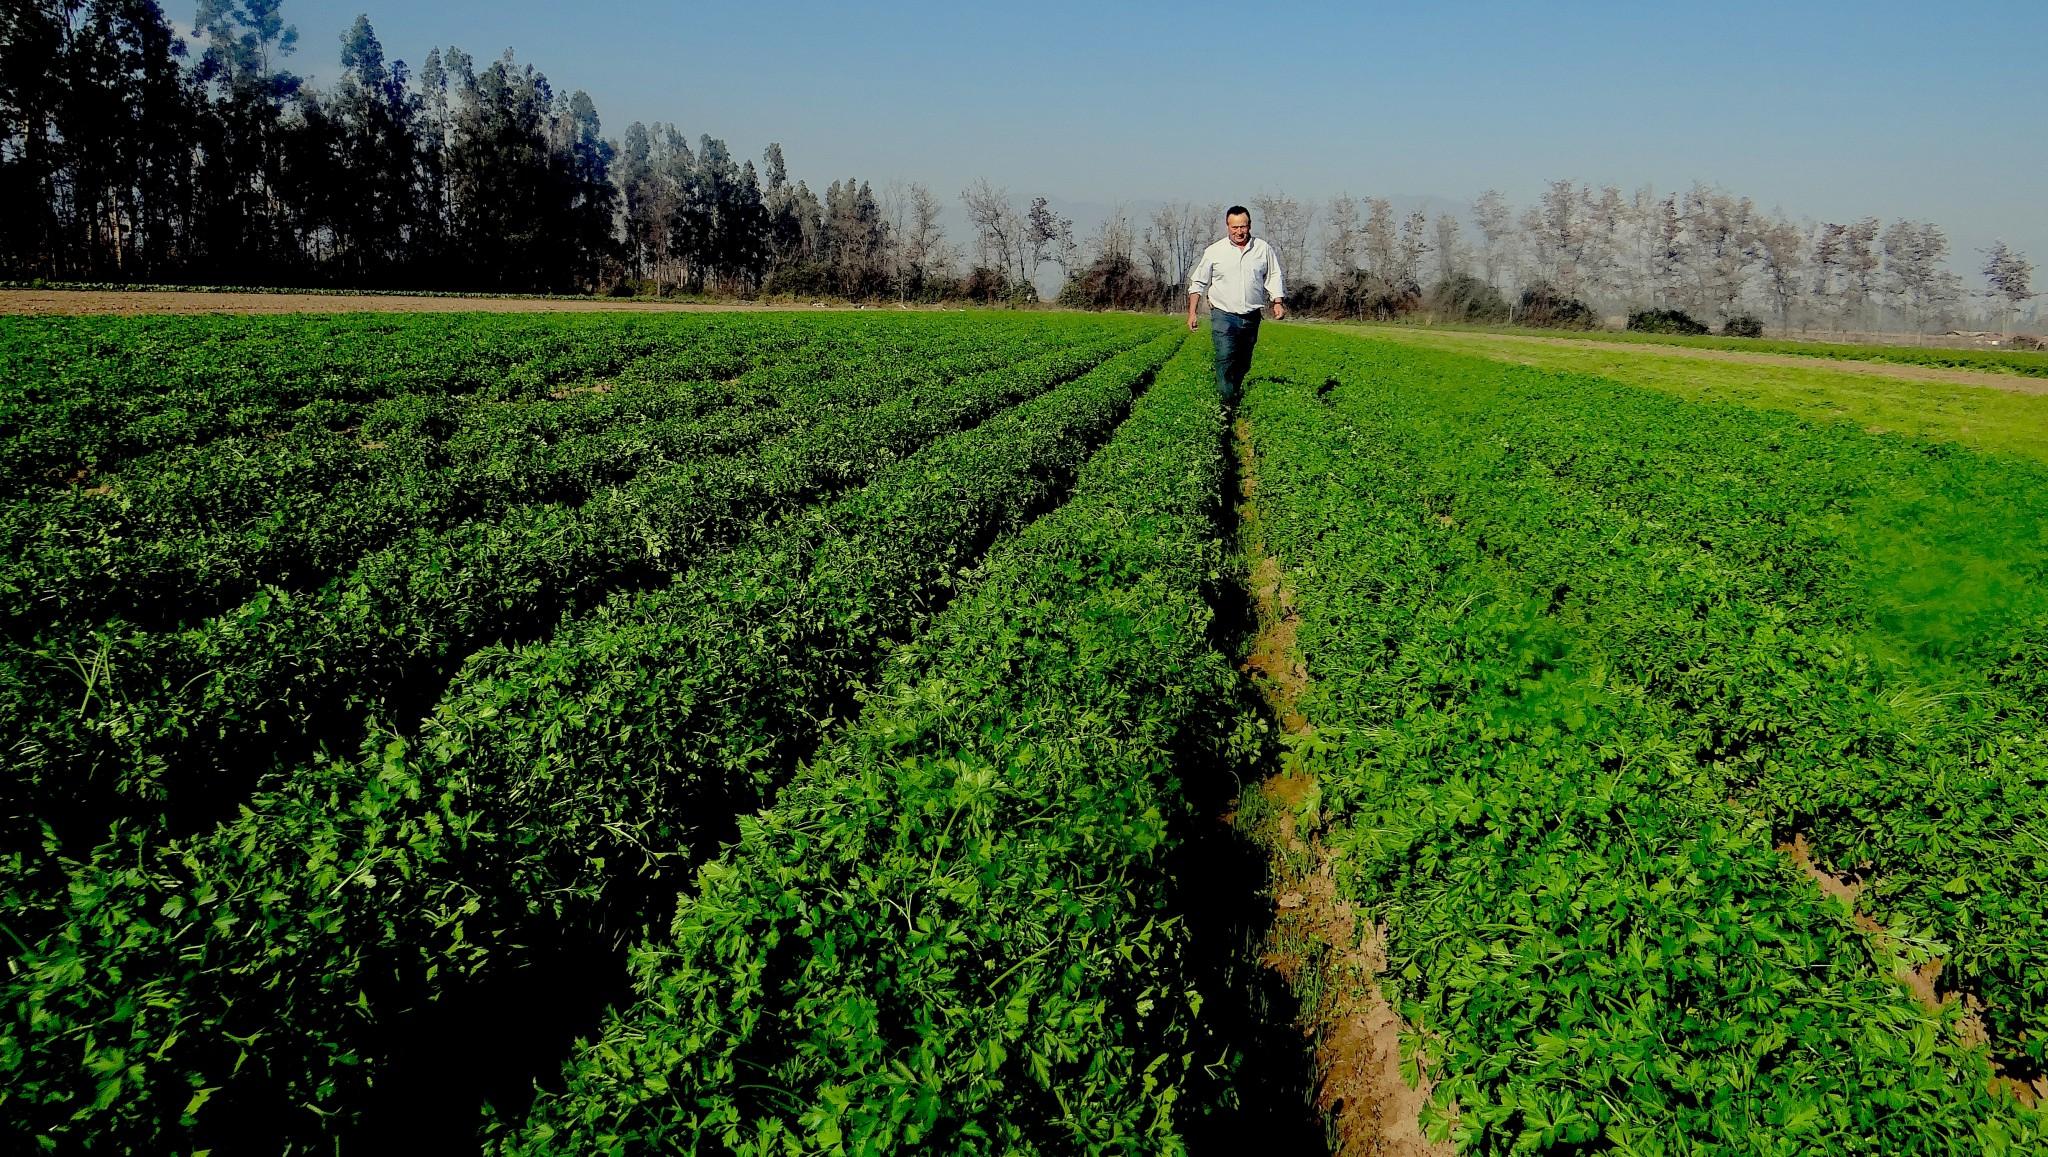 Bachelet: Medida beneficiará a 30 mil productores agrícolas